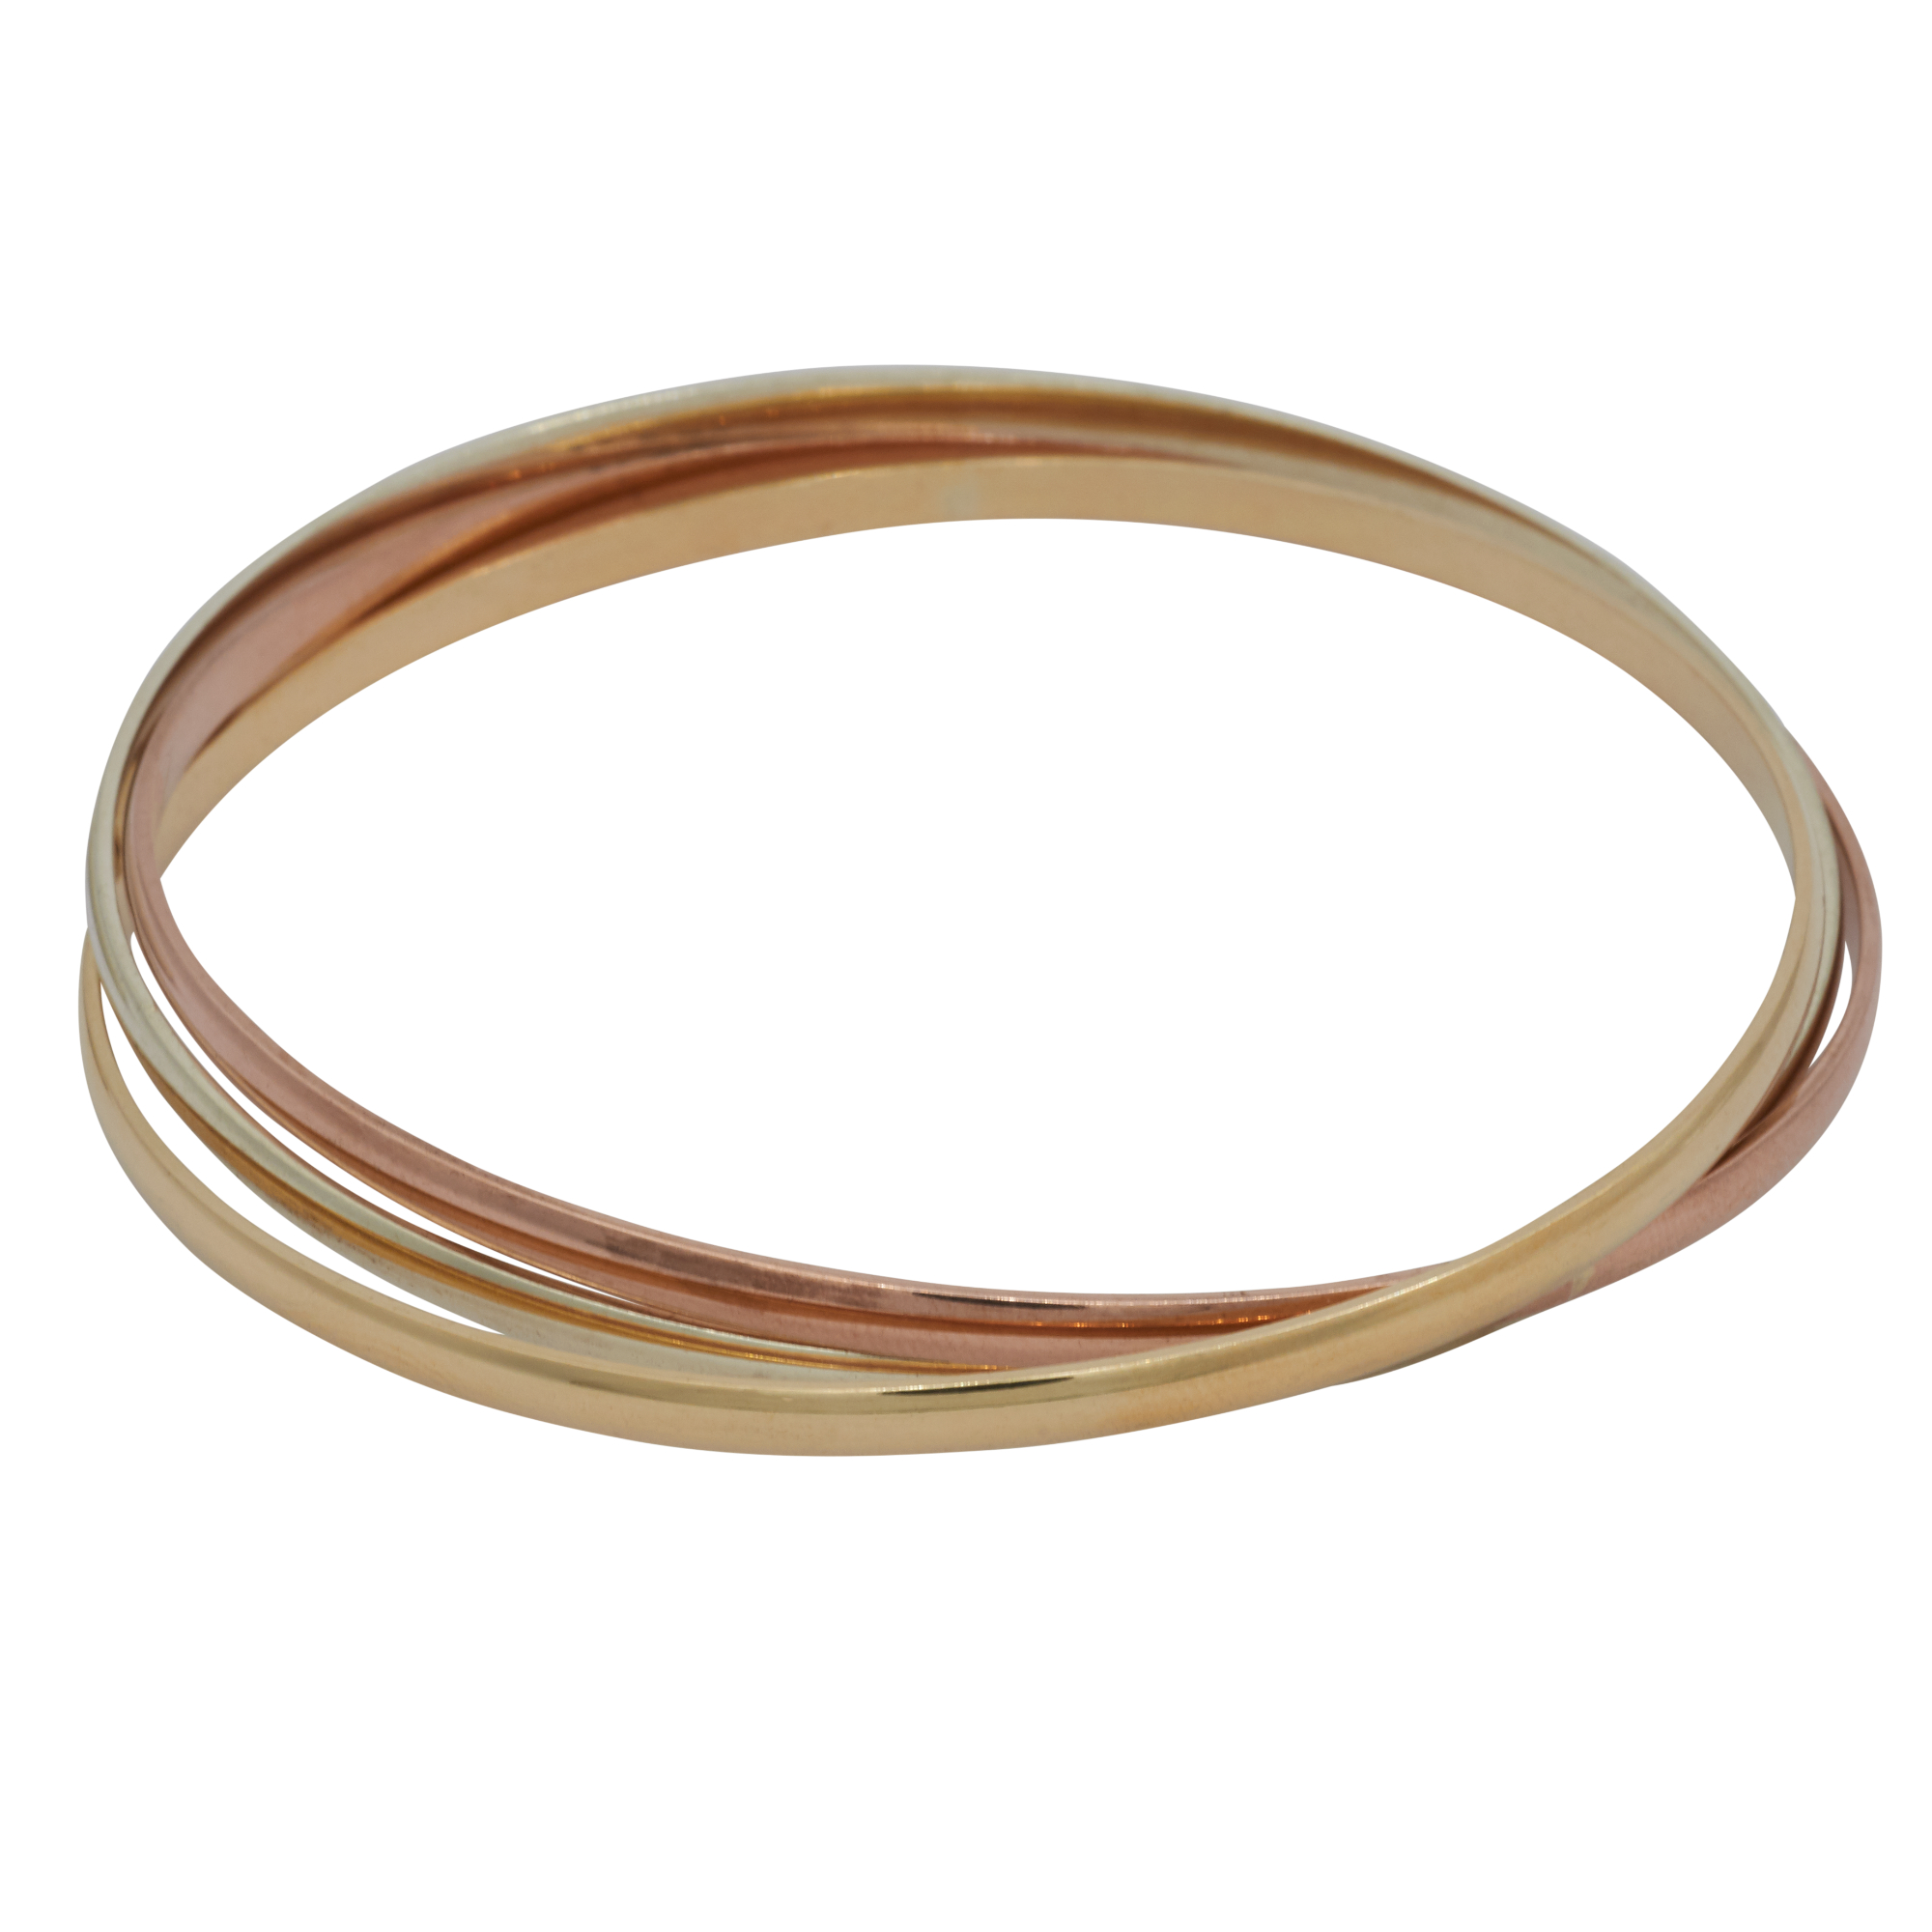 3 Colour 9ct Gold Russian Bangle